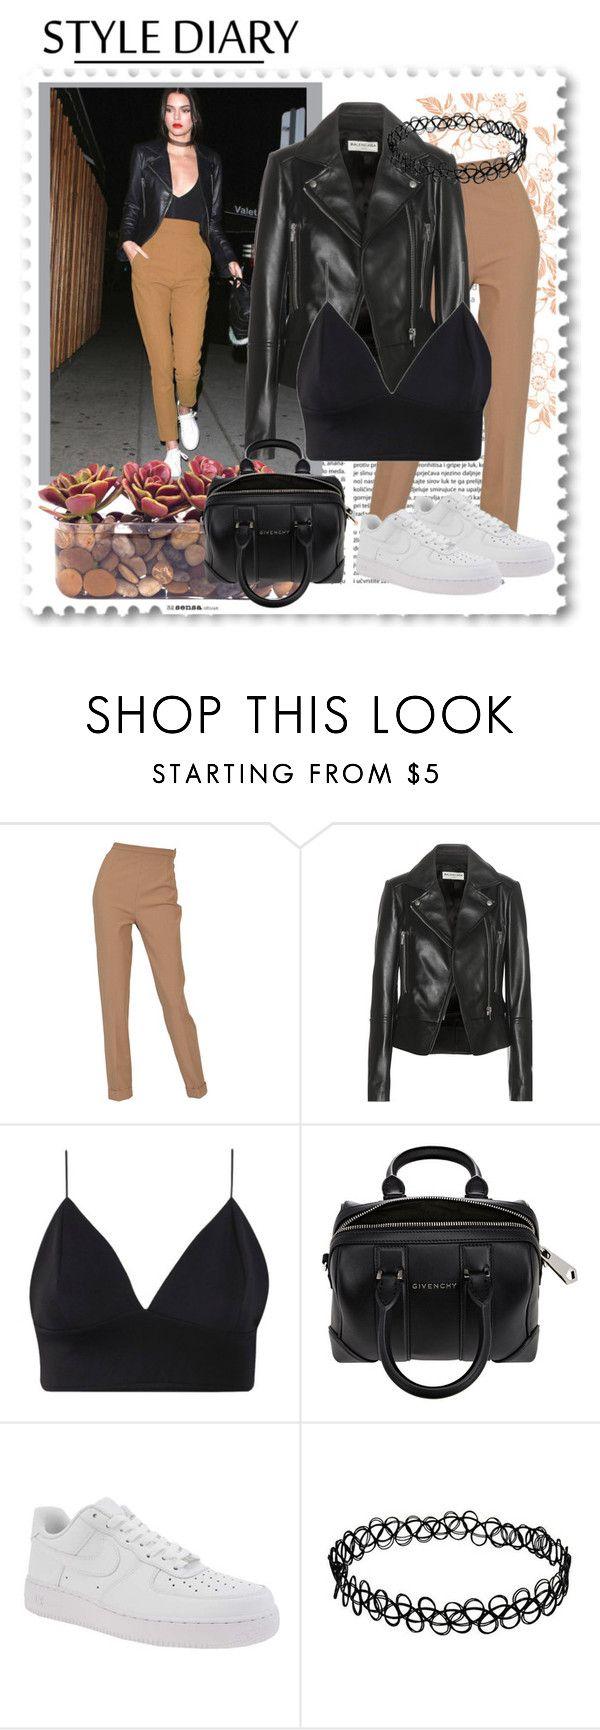 """Kendall Jenner"" by xcuteniallx ❤ liked on Polyvore featuring Hermès, Balenciaga, Givenchy, NIKE and John-Richard"